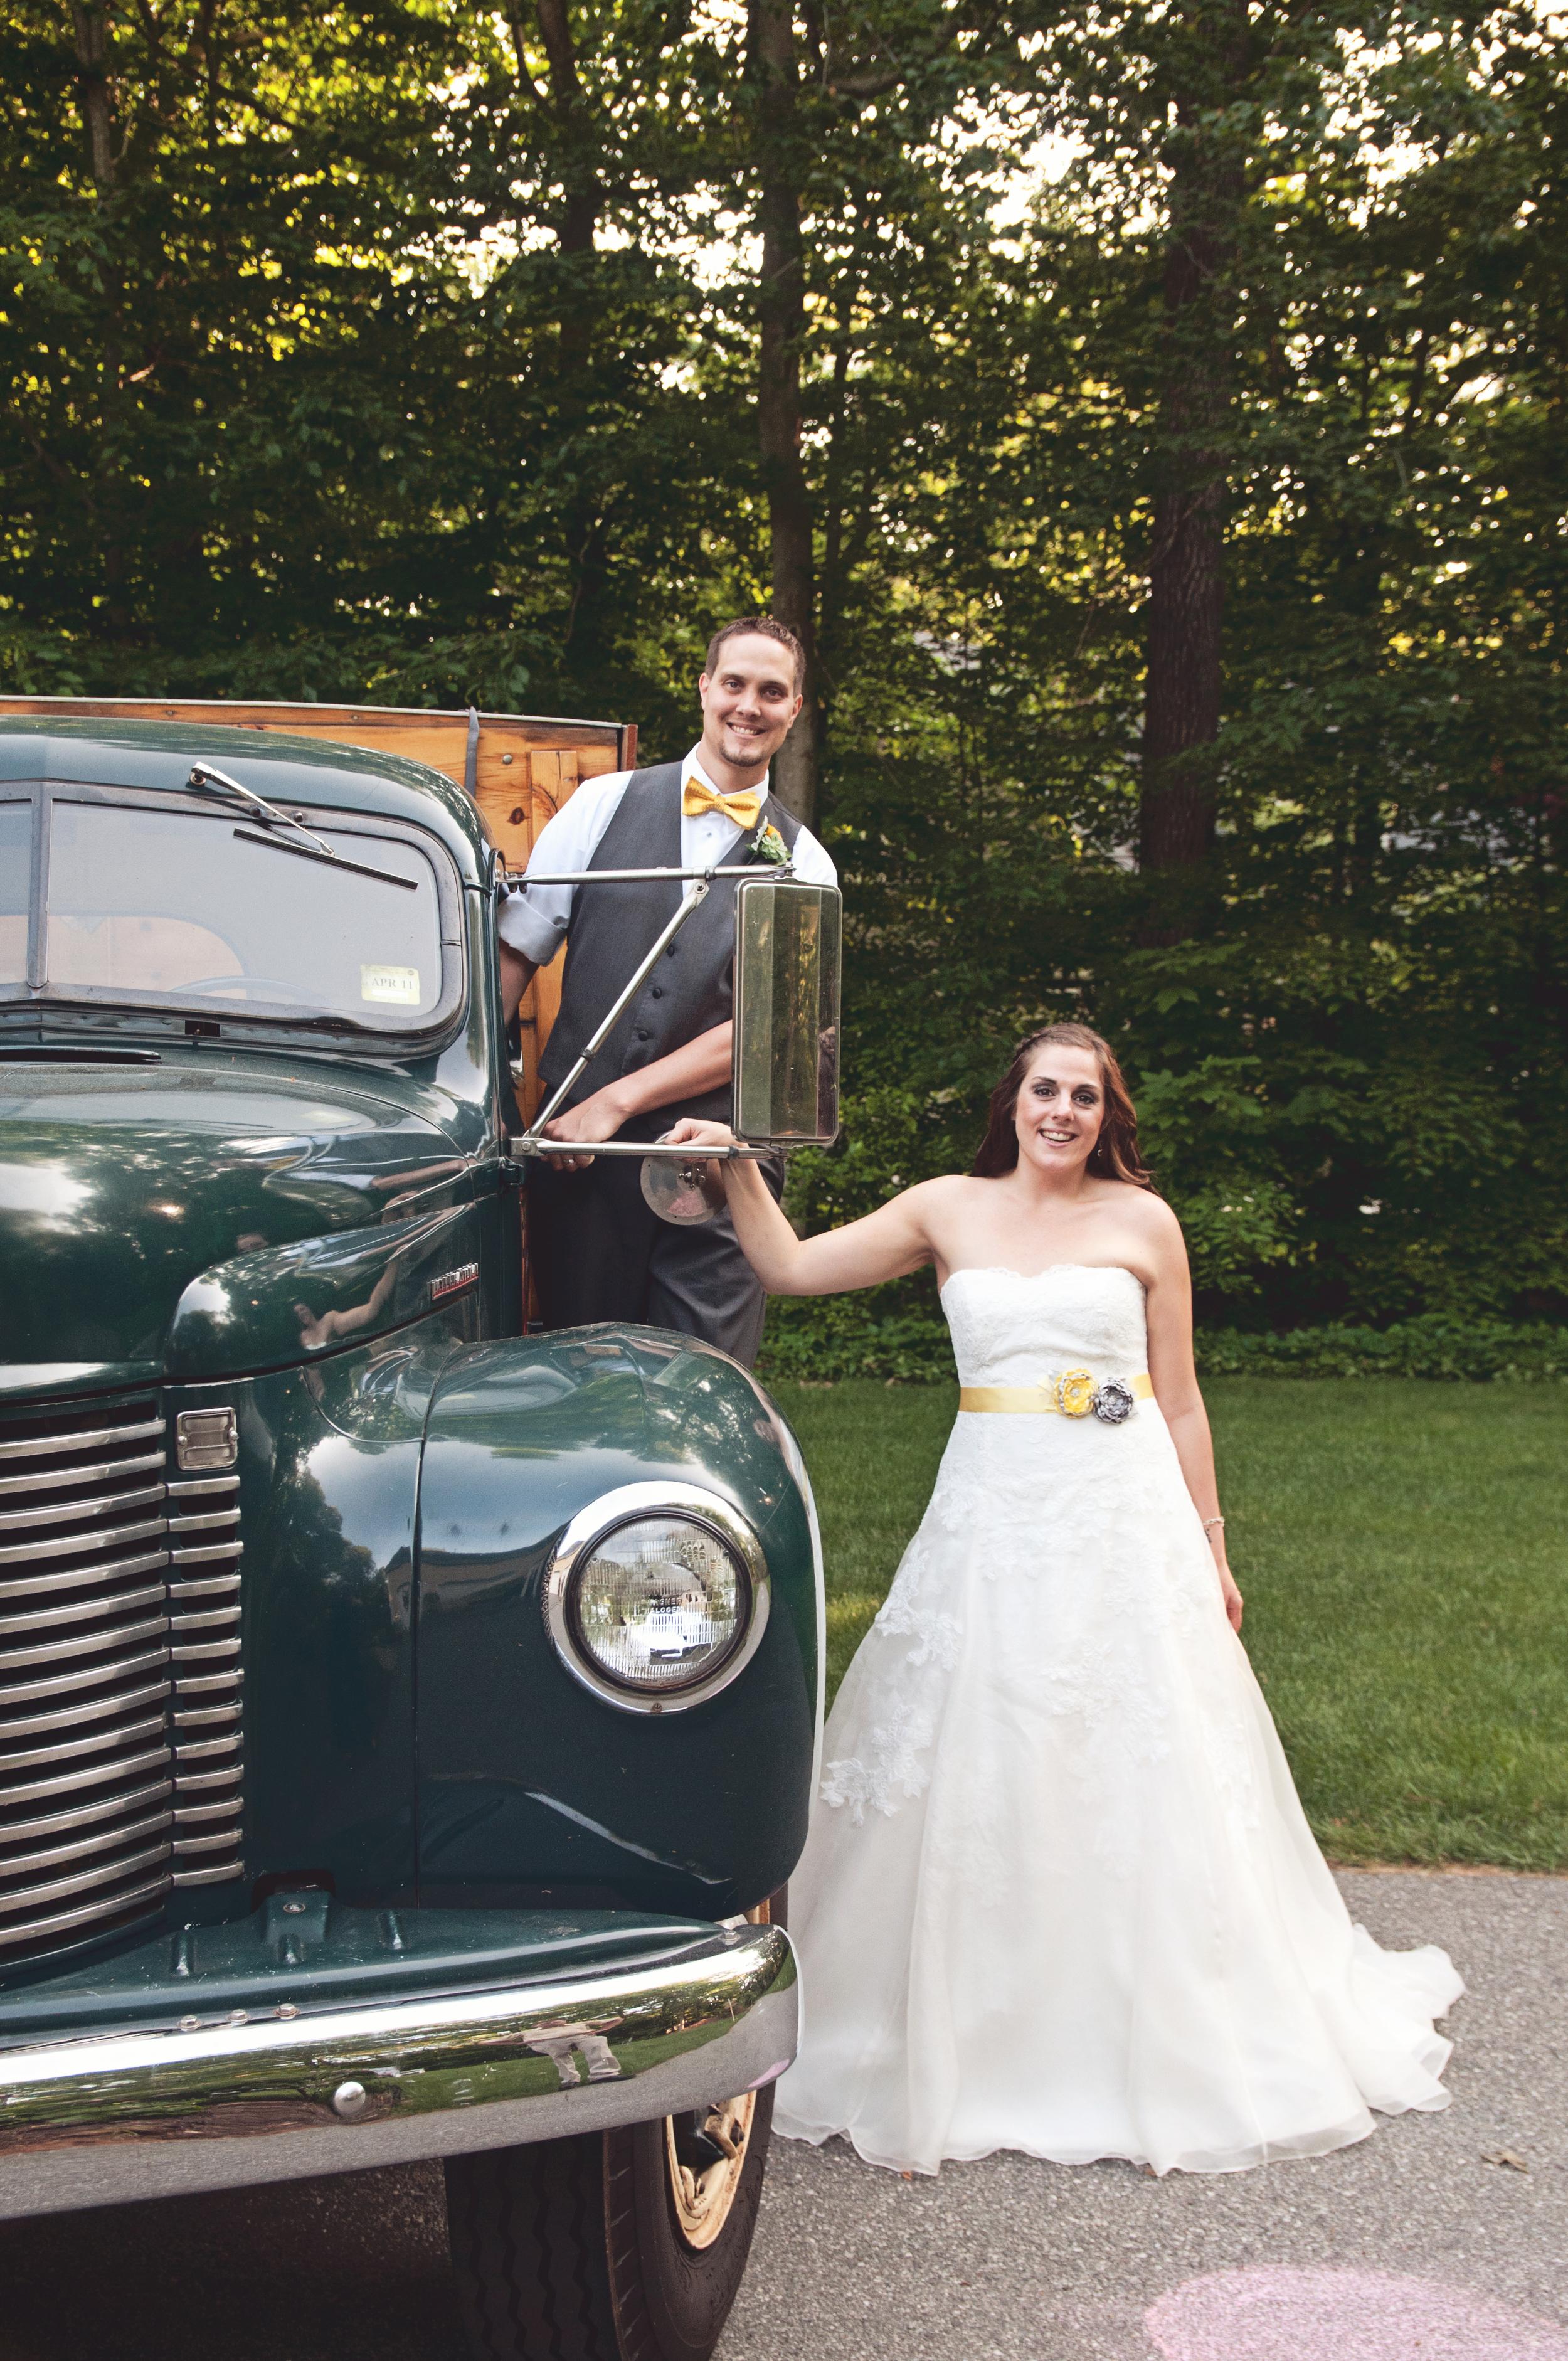 Angela_Chicoski_CT_wedding_photographer_028.jpg